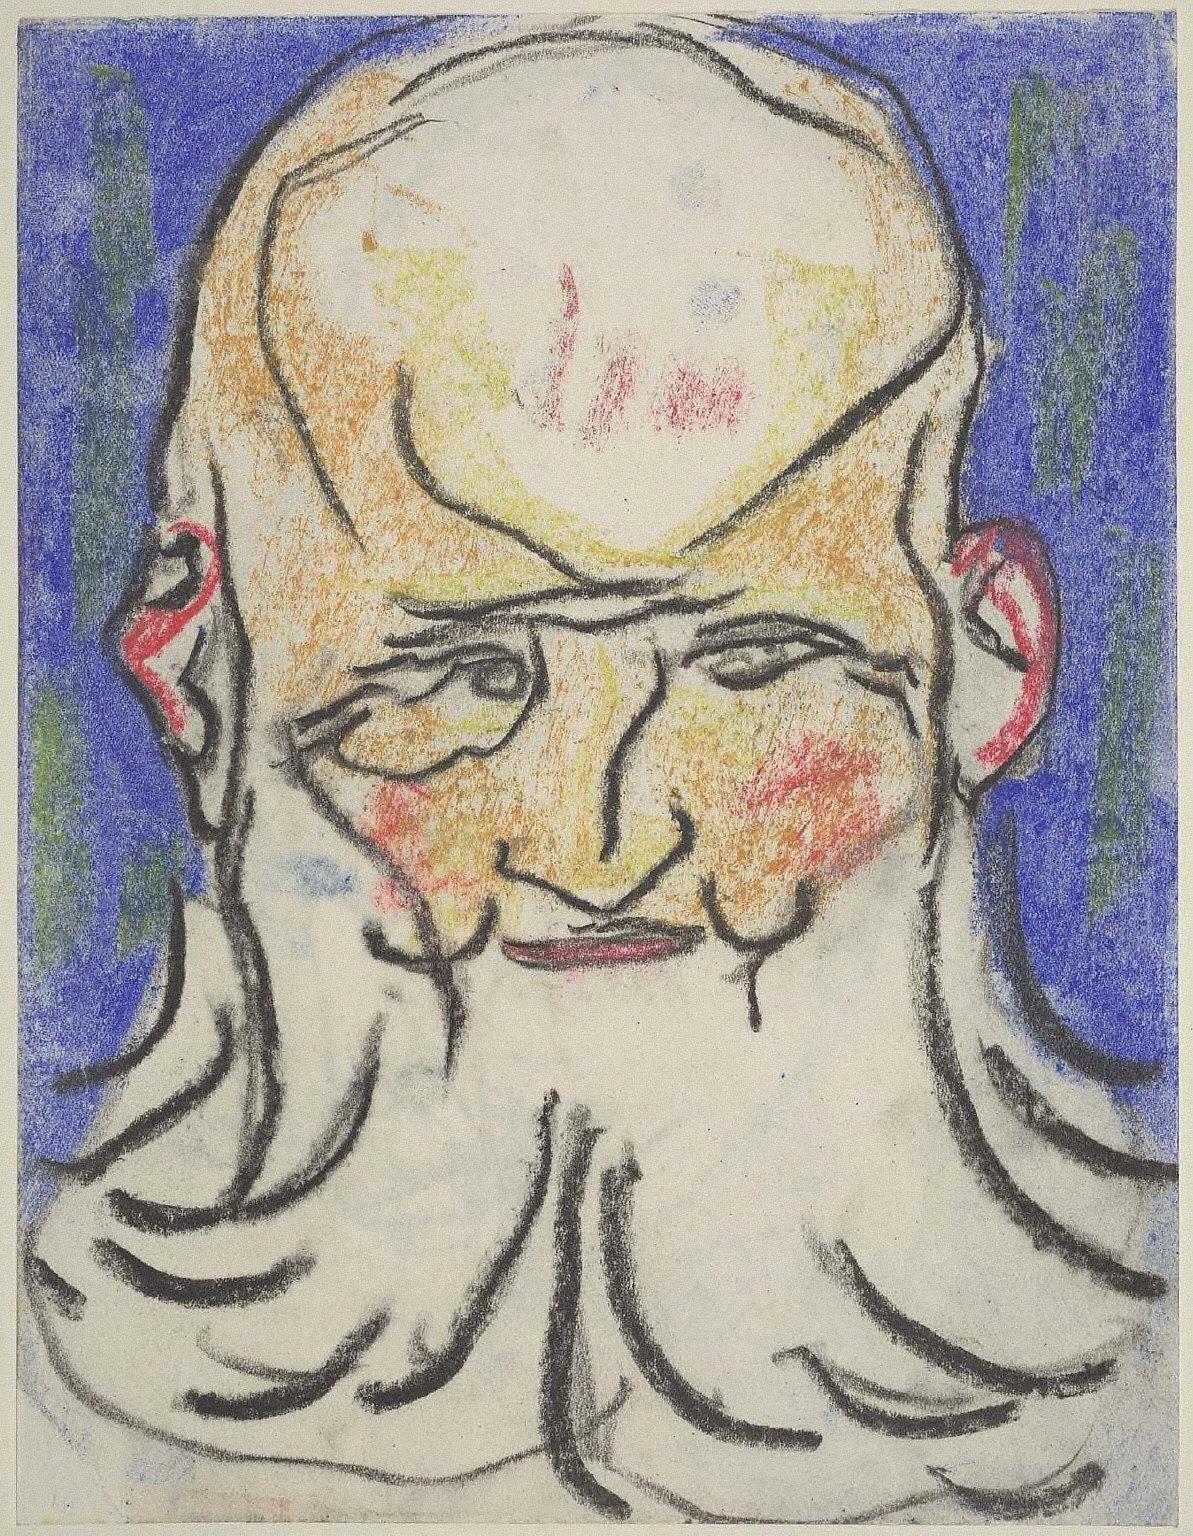 Man with a White Beard